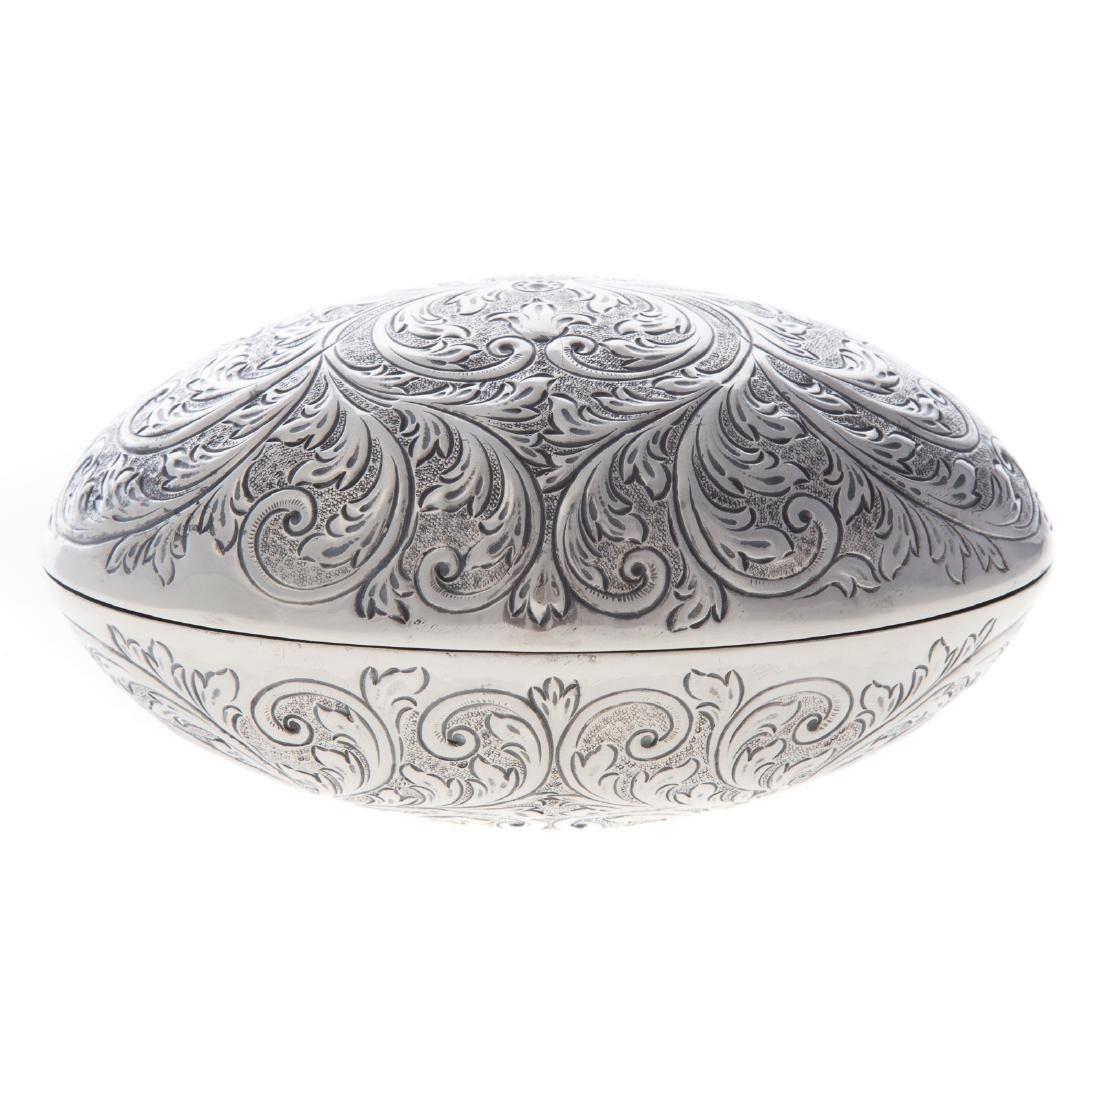 Continental silver hinged box